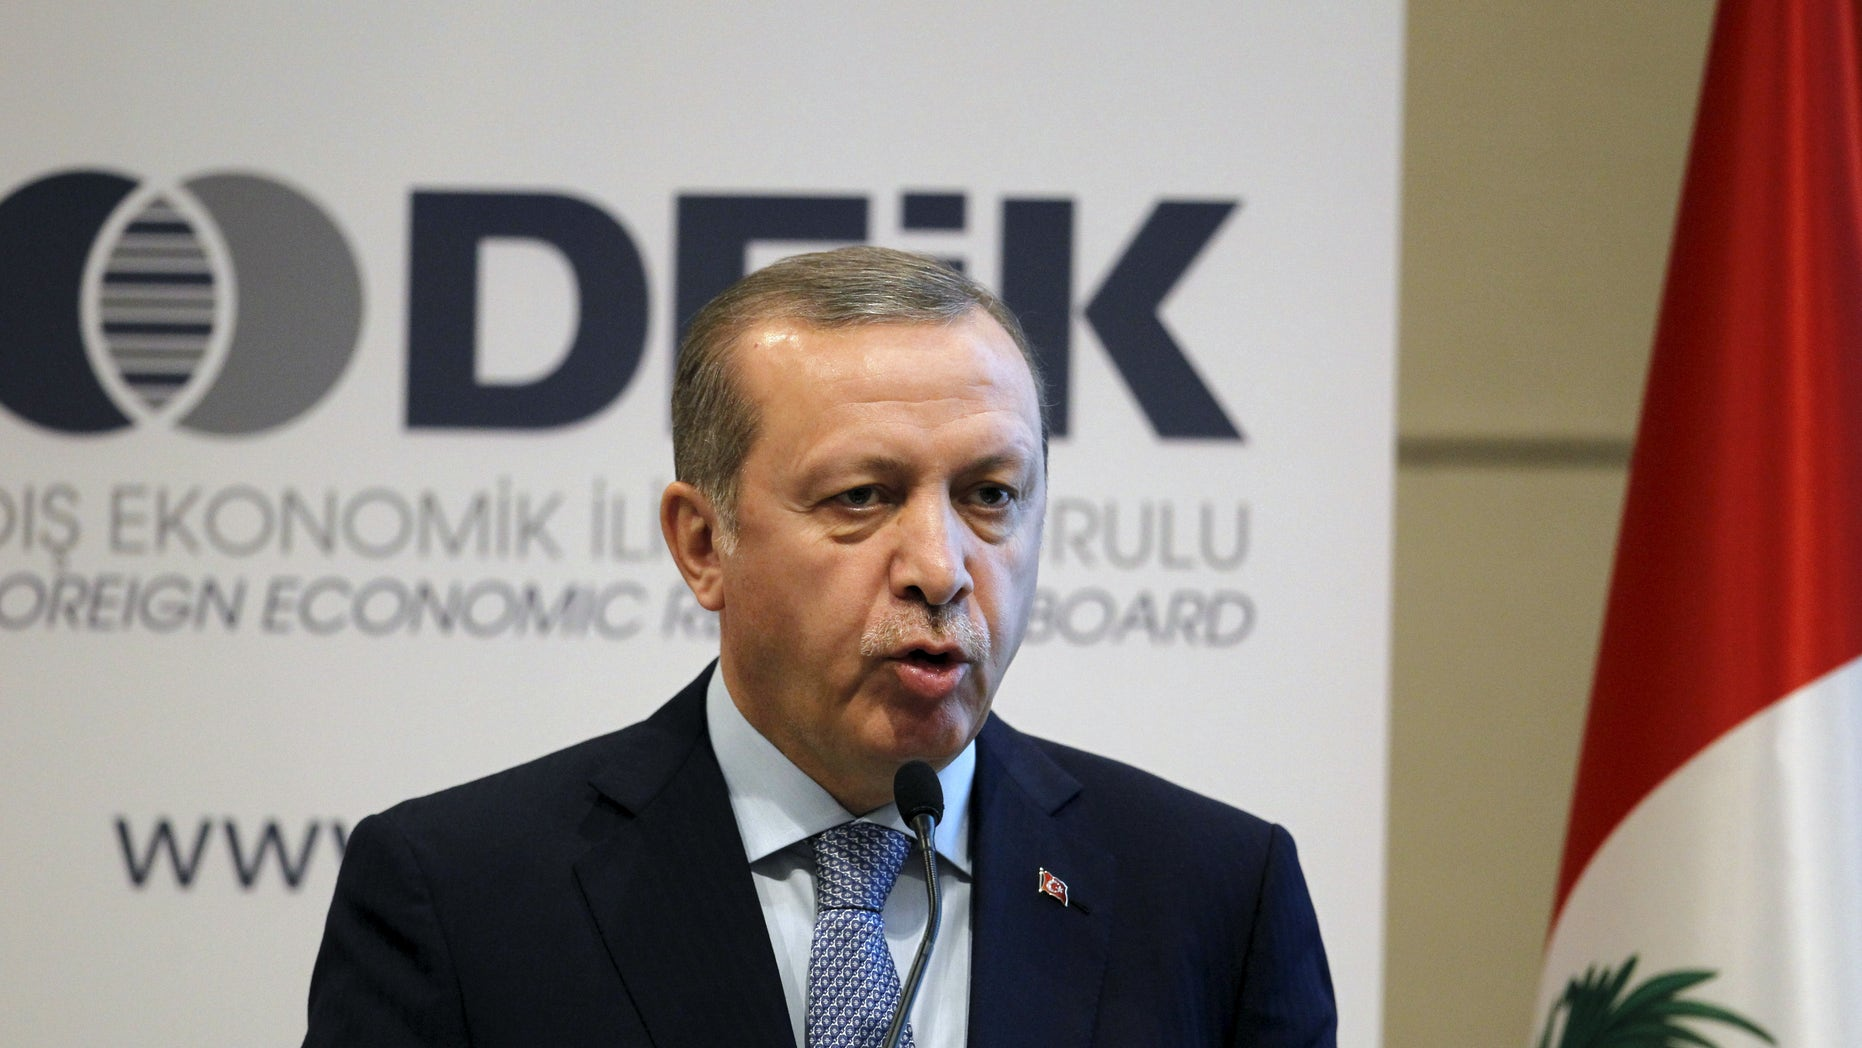 Feb. 3, 2016: Turkish President Tayyip Erdogan talks at a business forum during a visit in Lima, Peru.(Reuters)